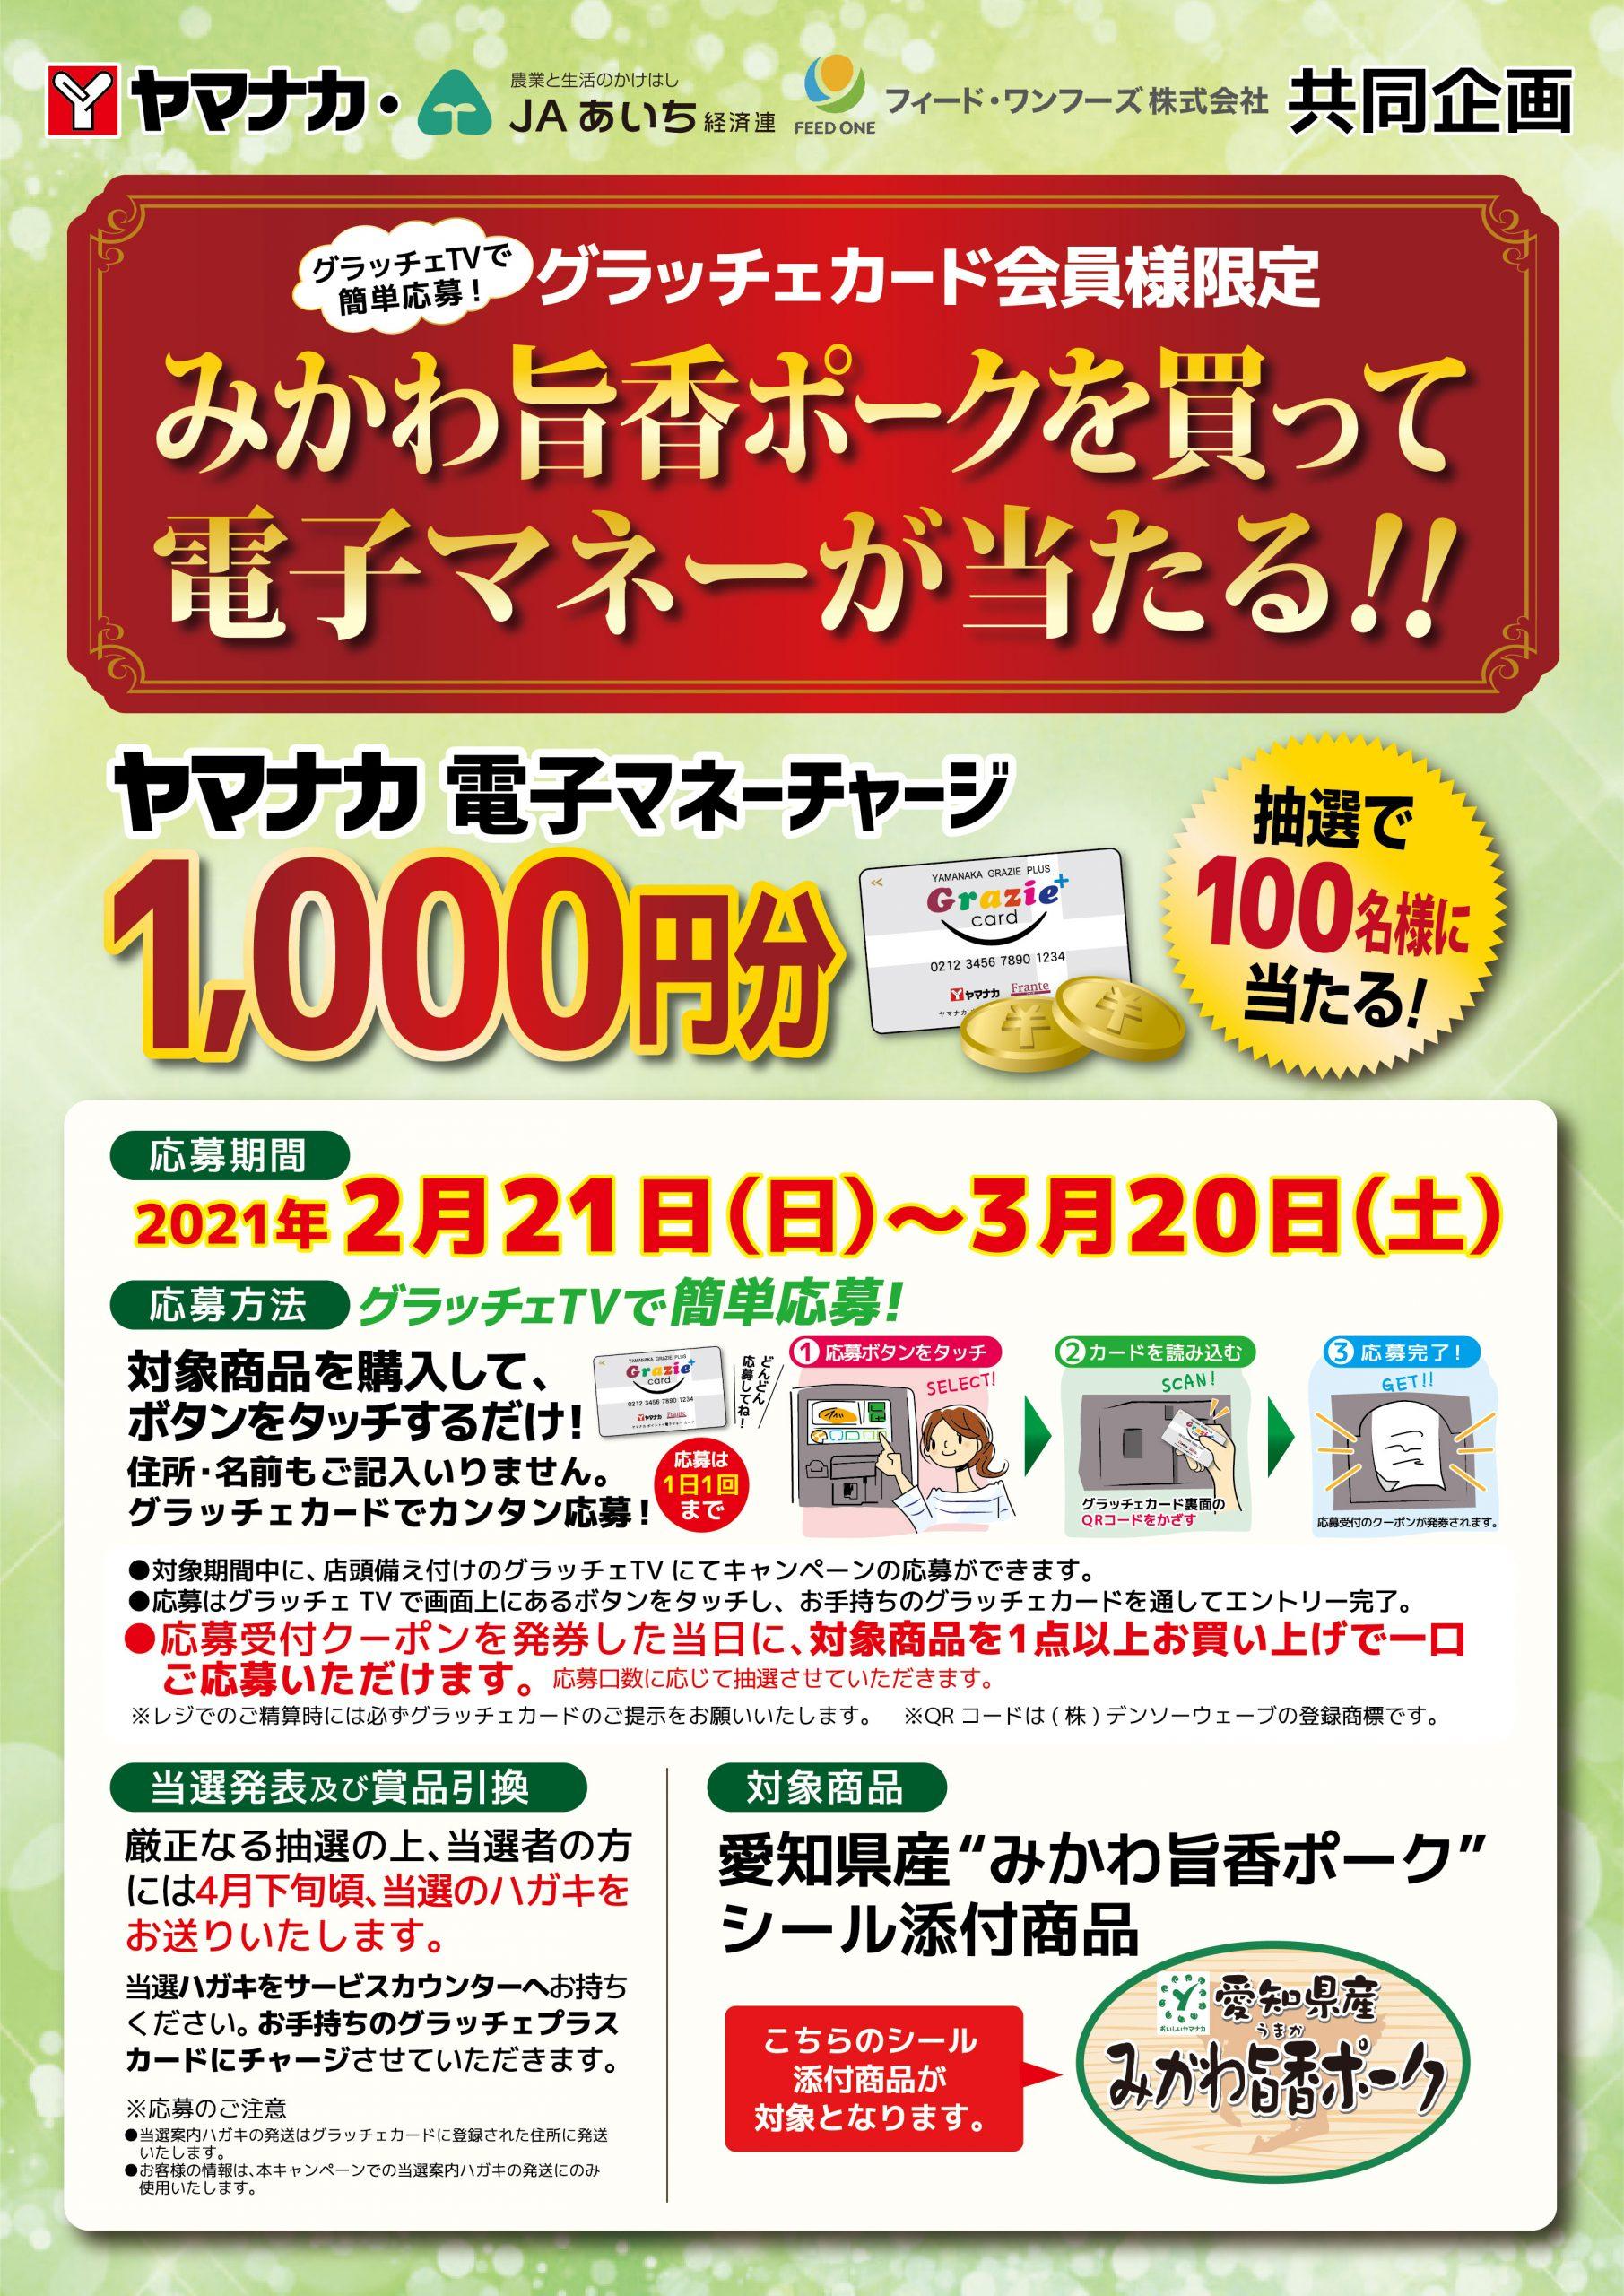 https://www.super-yamanaka.co.jp/wp/super/wp-content/uploads/2021/02/0221JAaiti-scaled.jpg